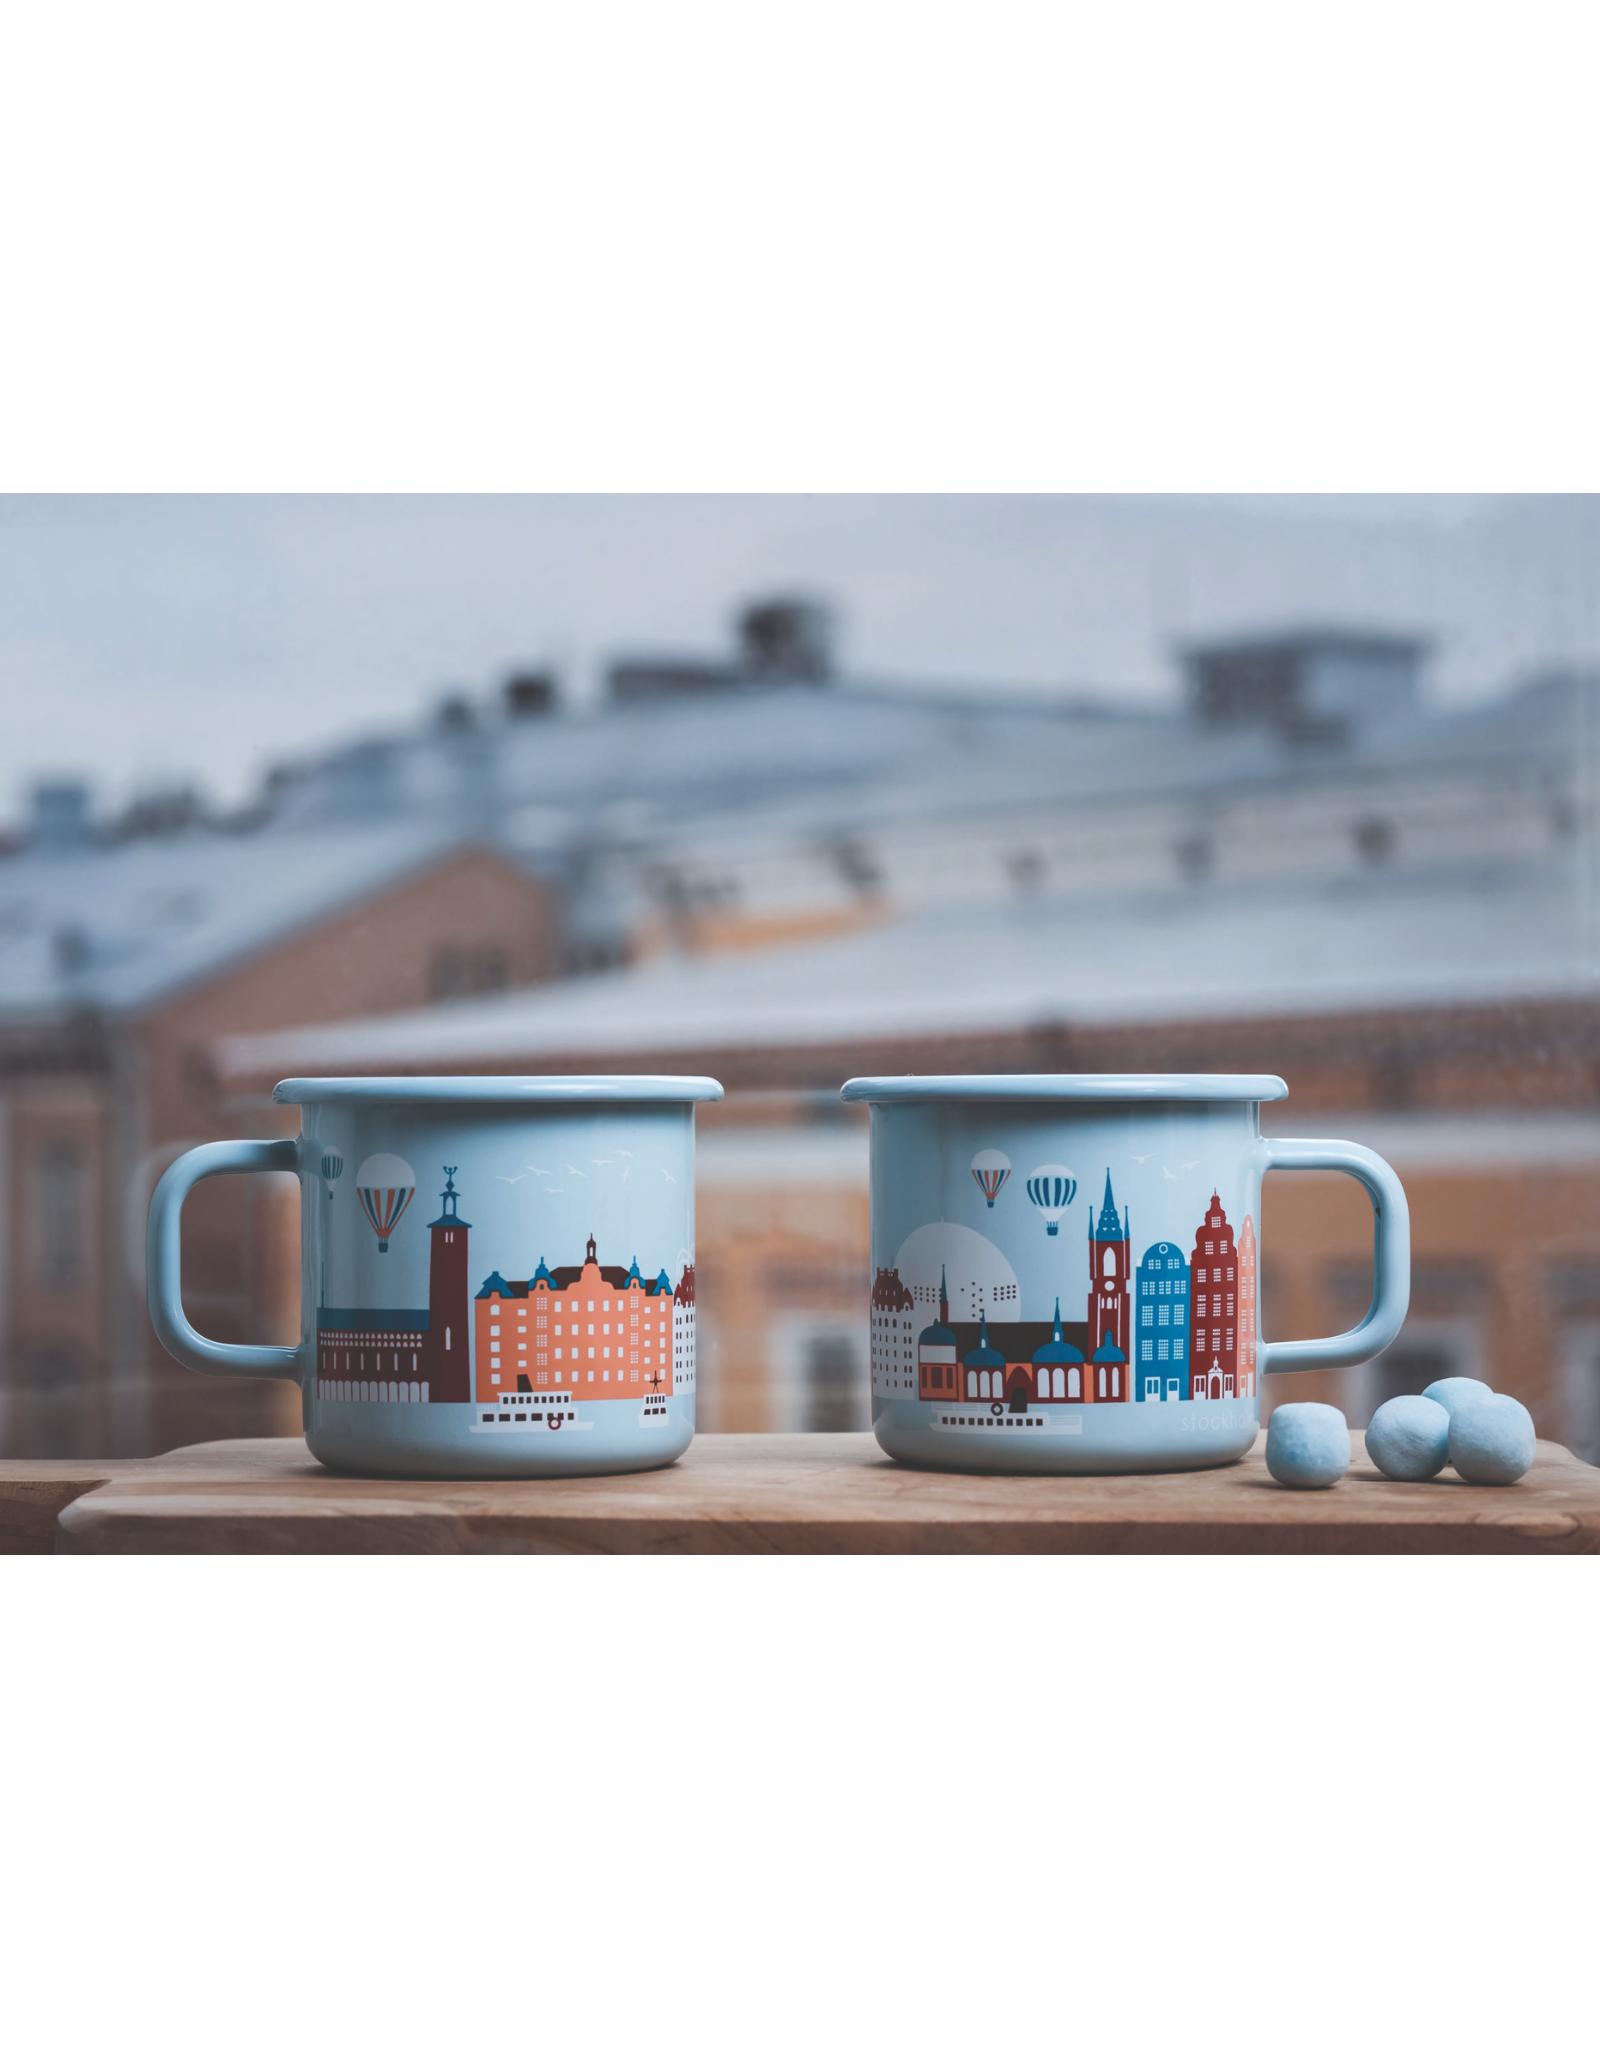 Muurla Mok Emaille | Stockholm 370ml